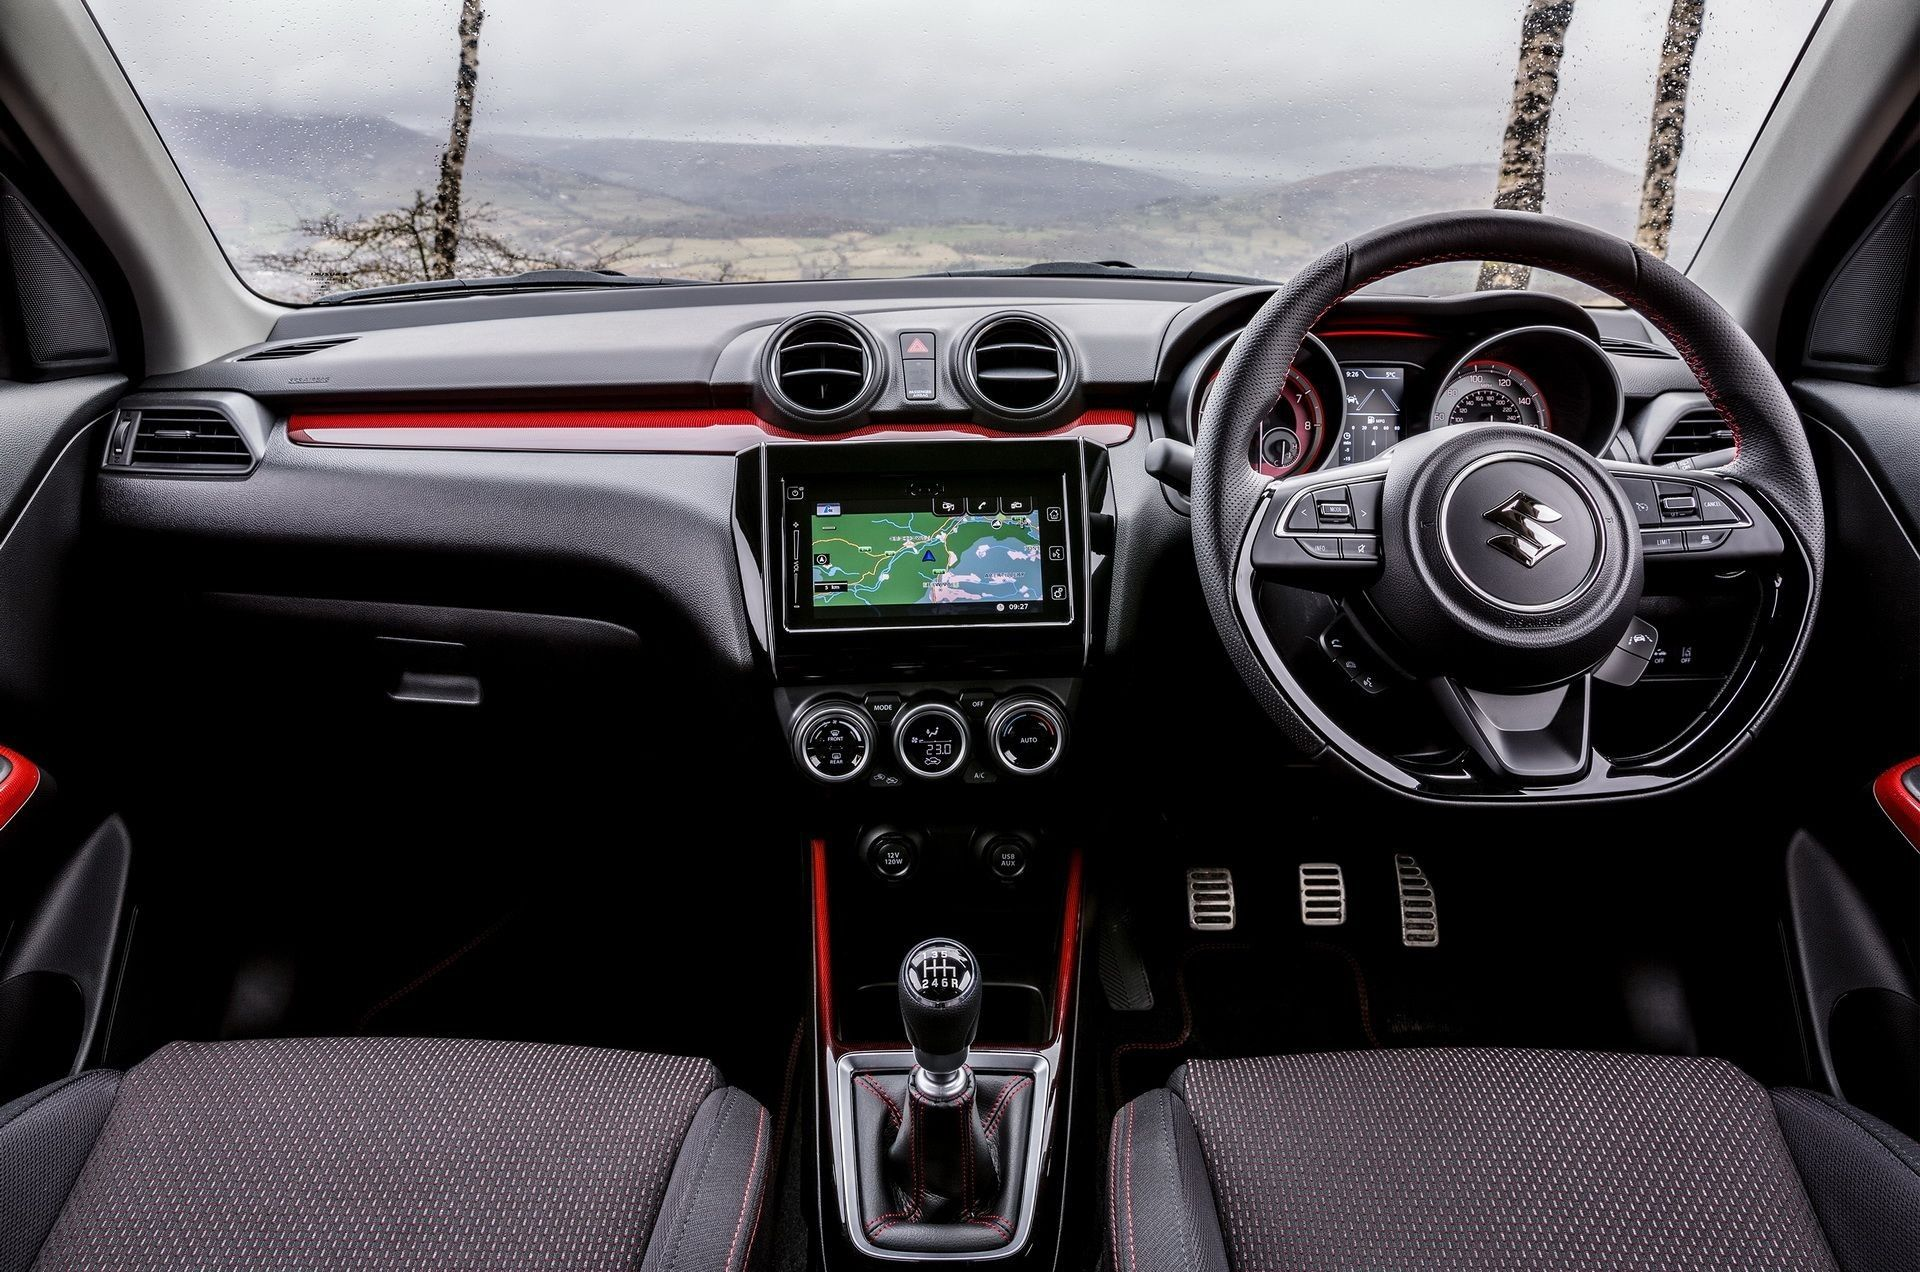 Suzuki Swift 2019 Sport Price Car Review 2019